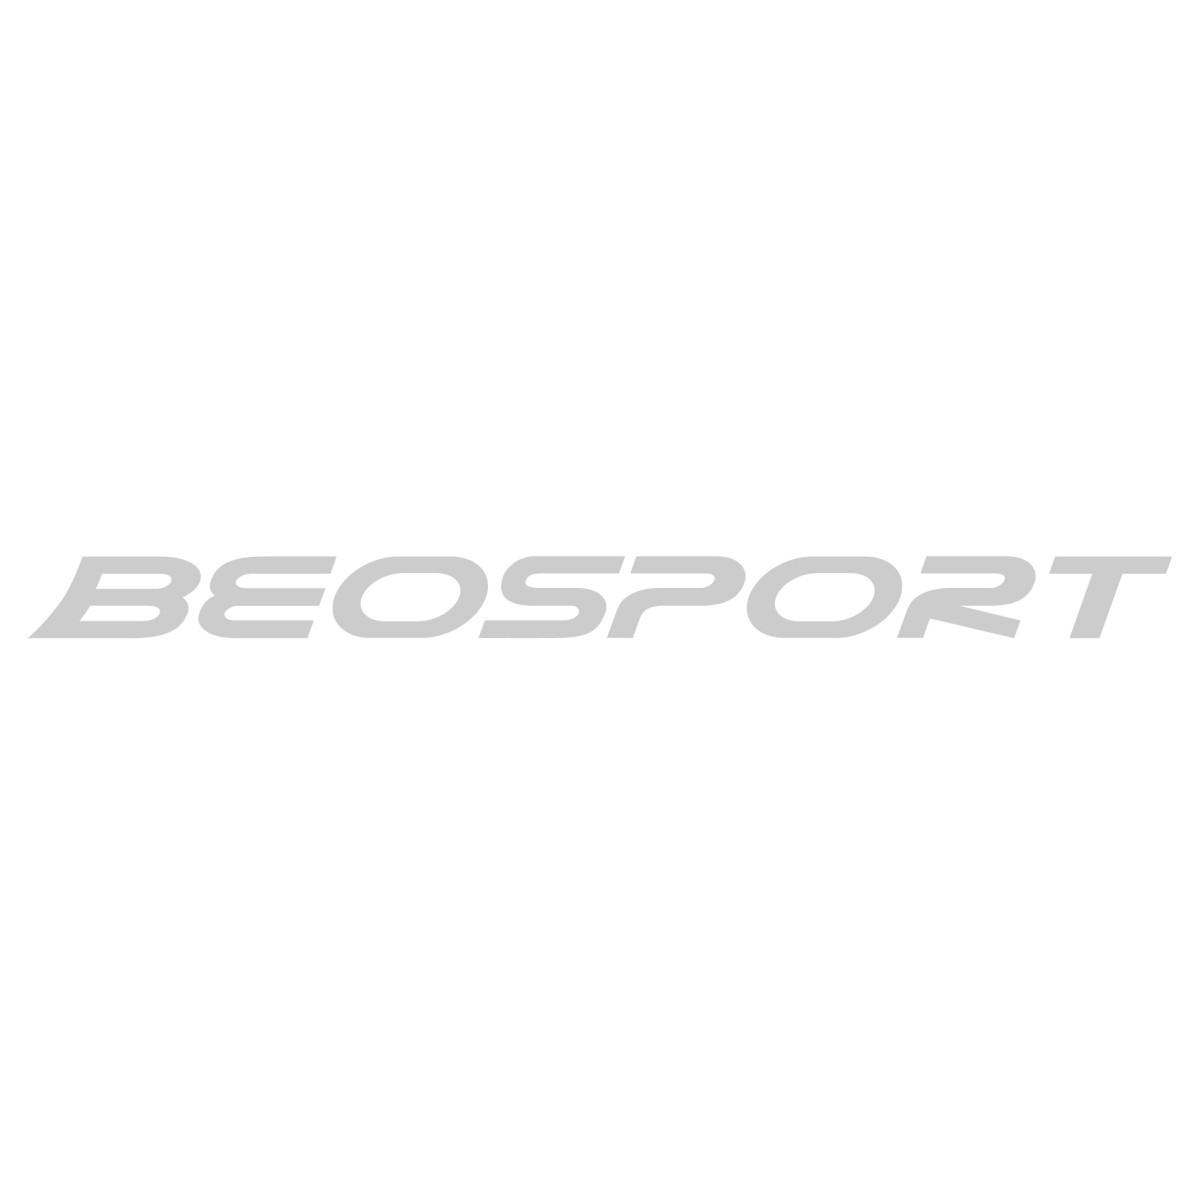 Wilson Ez Mark Cones (6pack) čunjevi